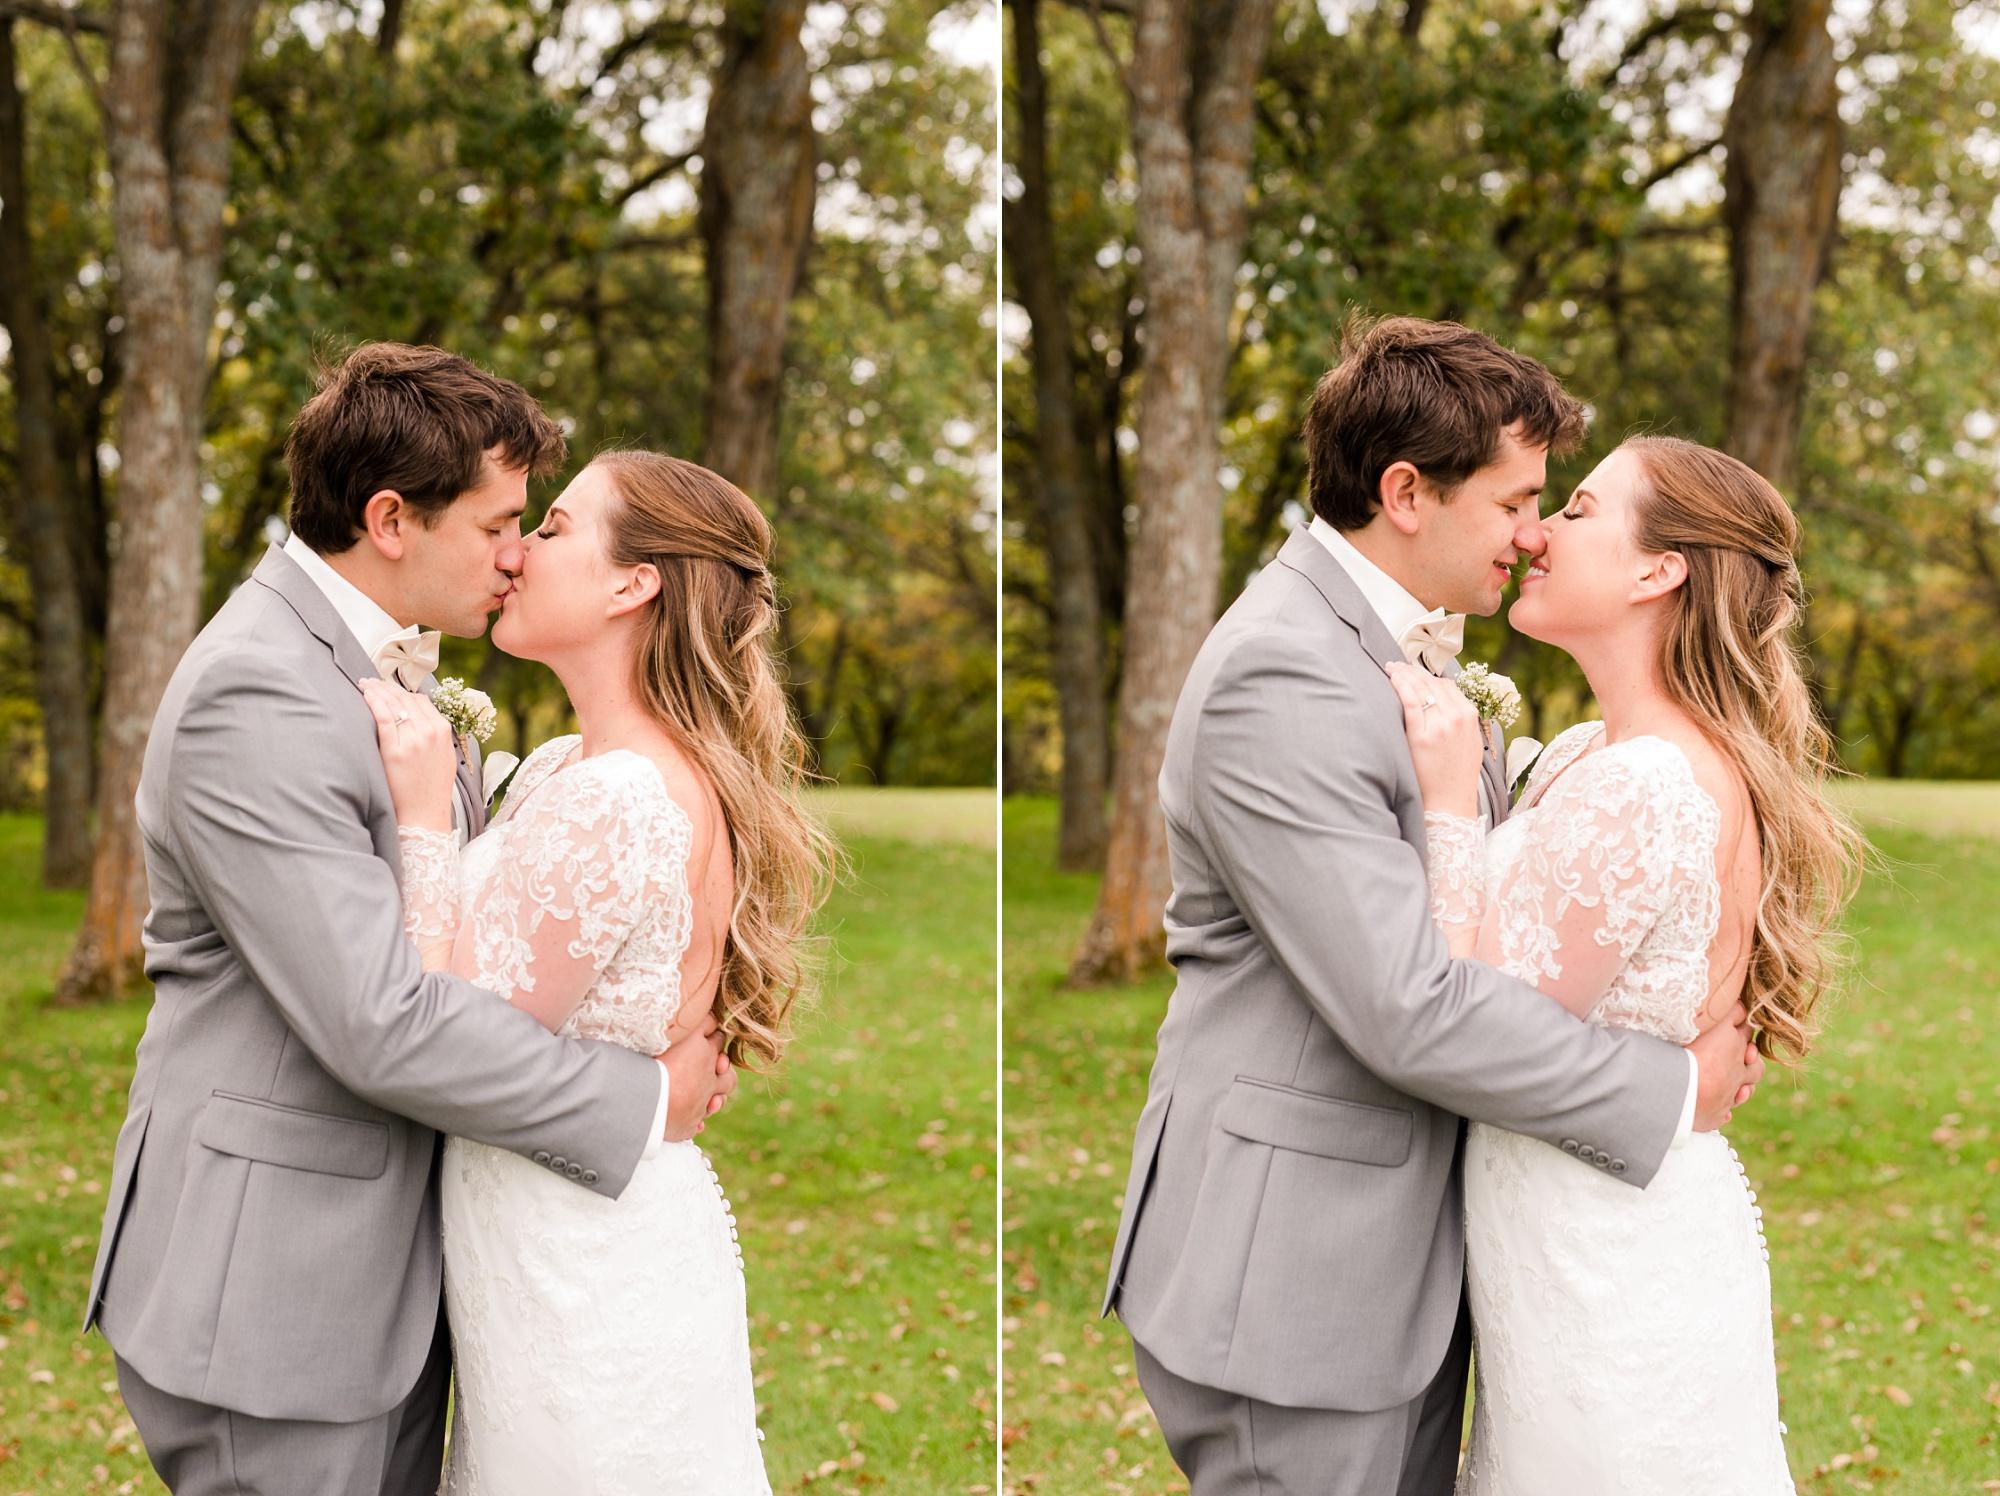 AmberLangerudPhotography_Fair Hills Resort Lakeside Wedding in Minnesota_3435.jpg